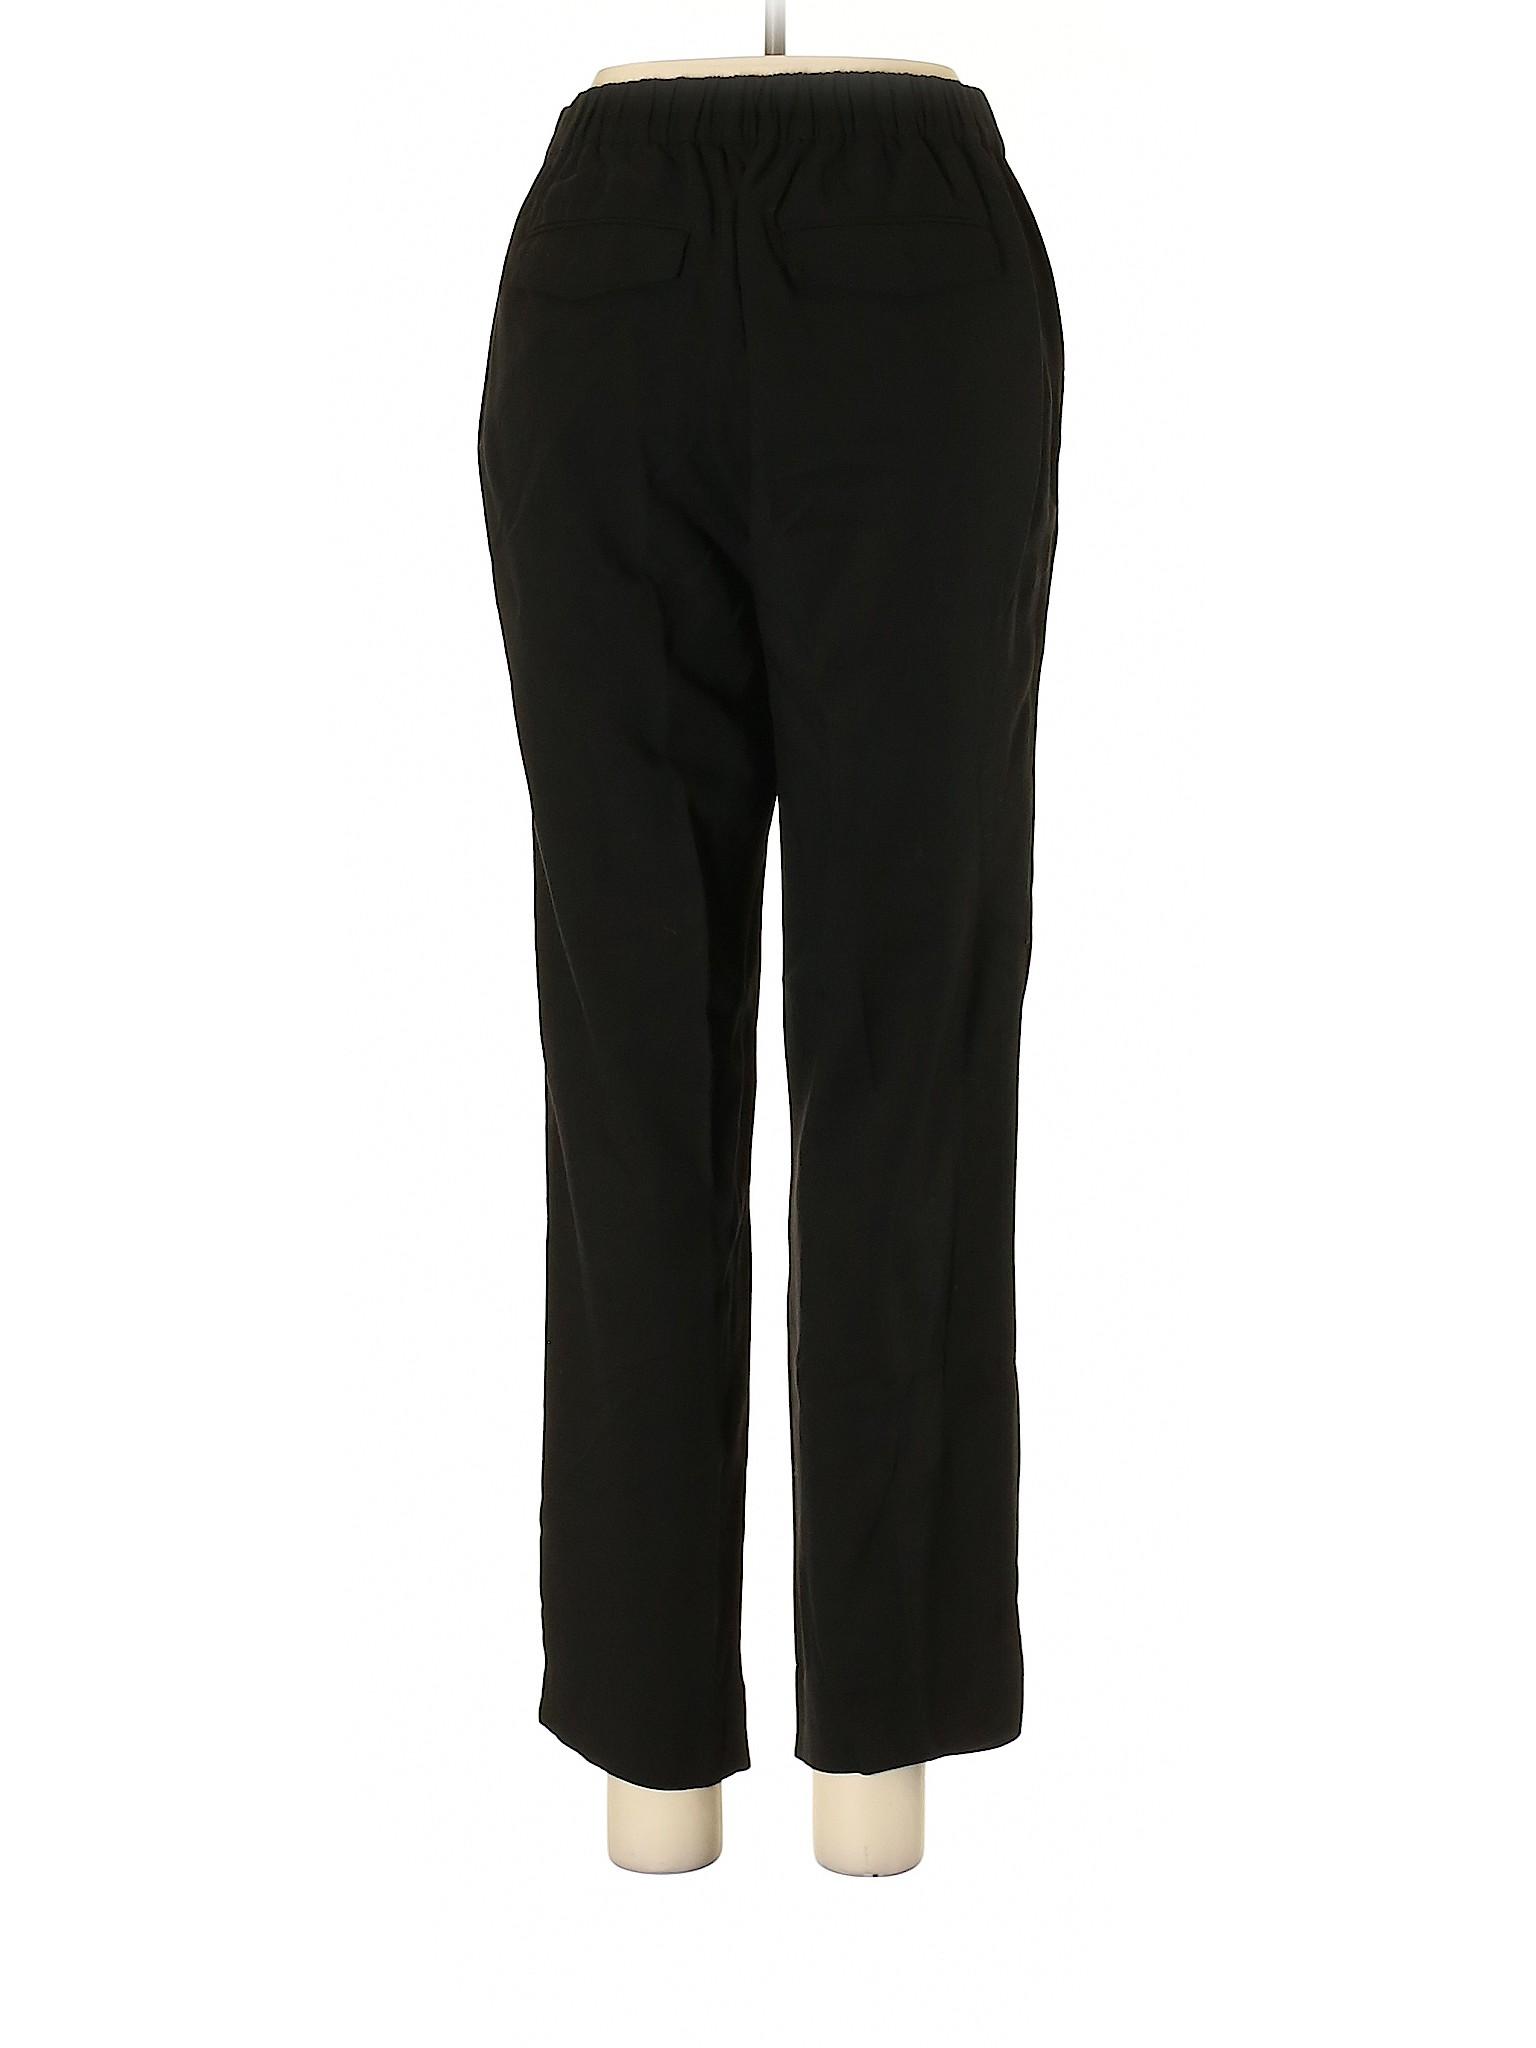 8430f03727276 Madewell 100% Viscose Solid Black Dress Pants Size S - 83% off | thredUP